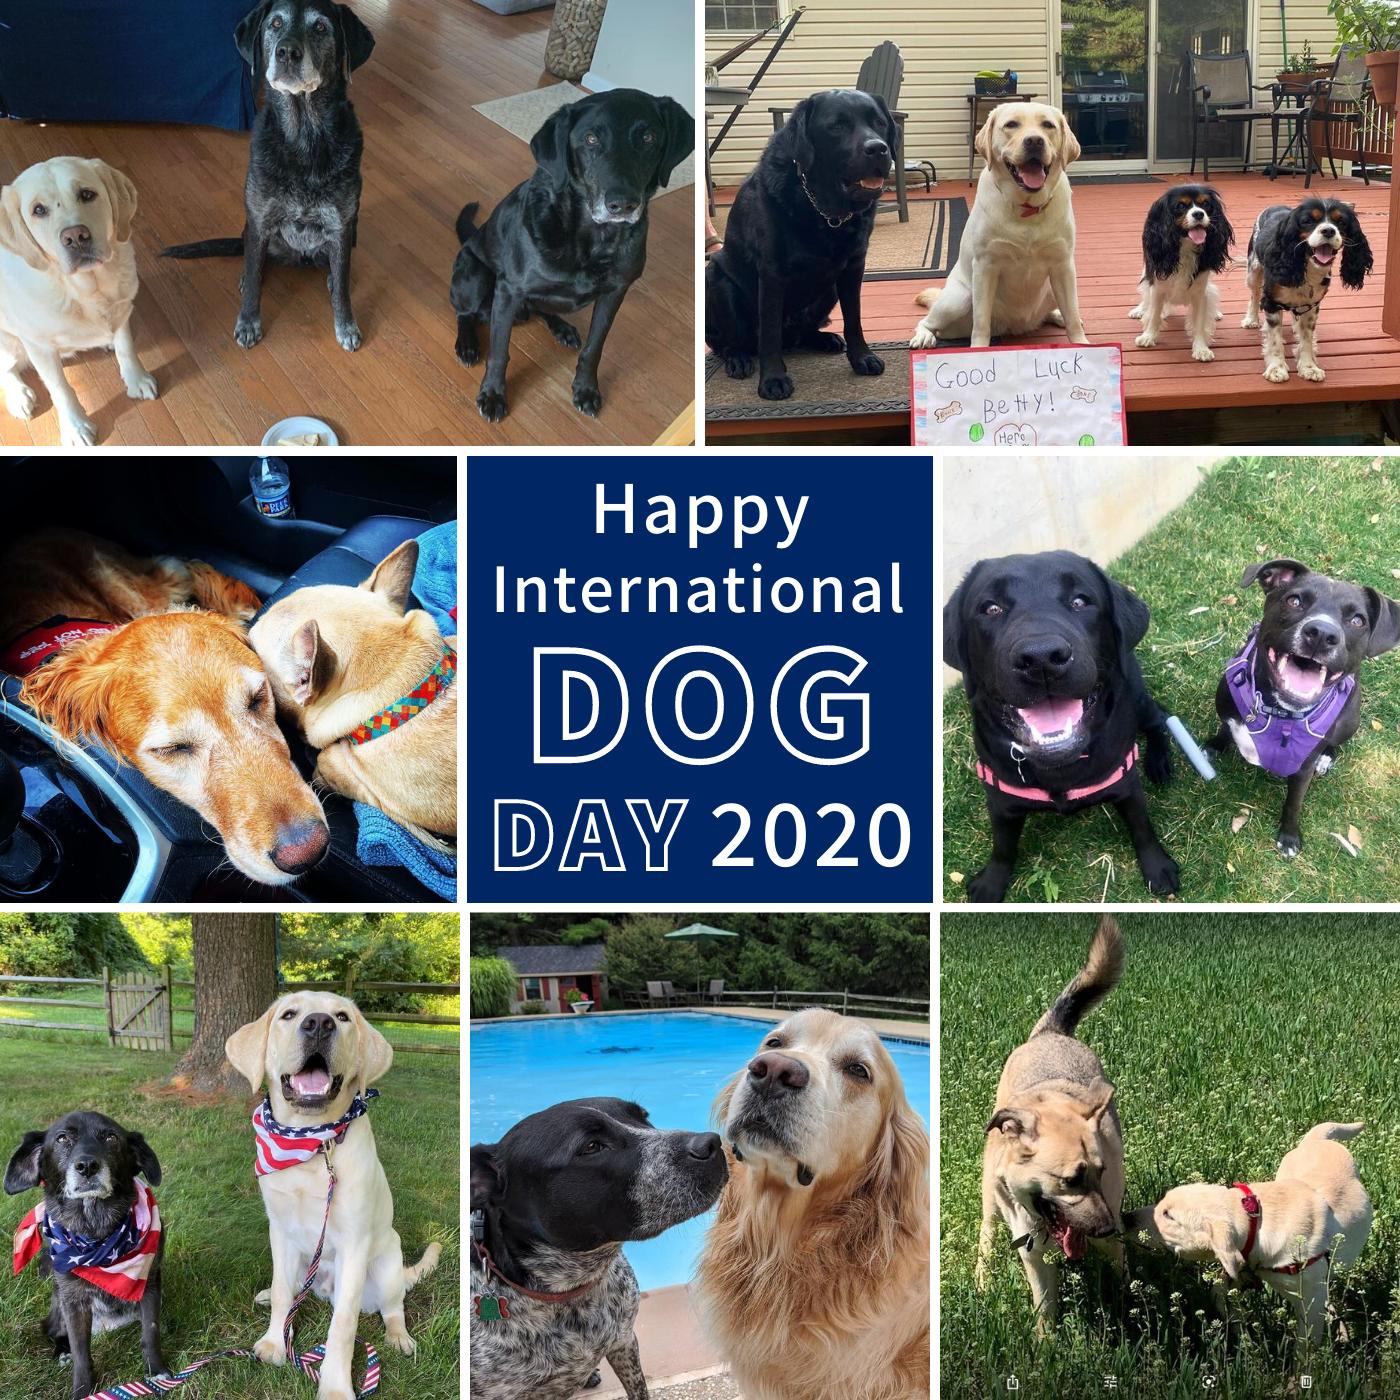 International Dog Day 2020 collage 1